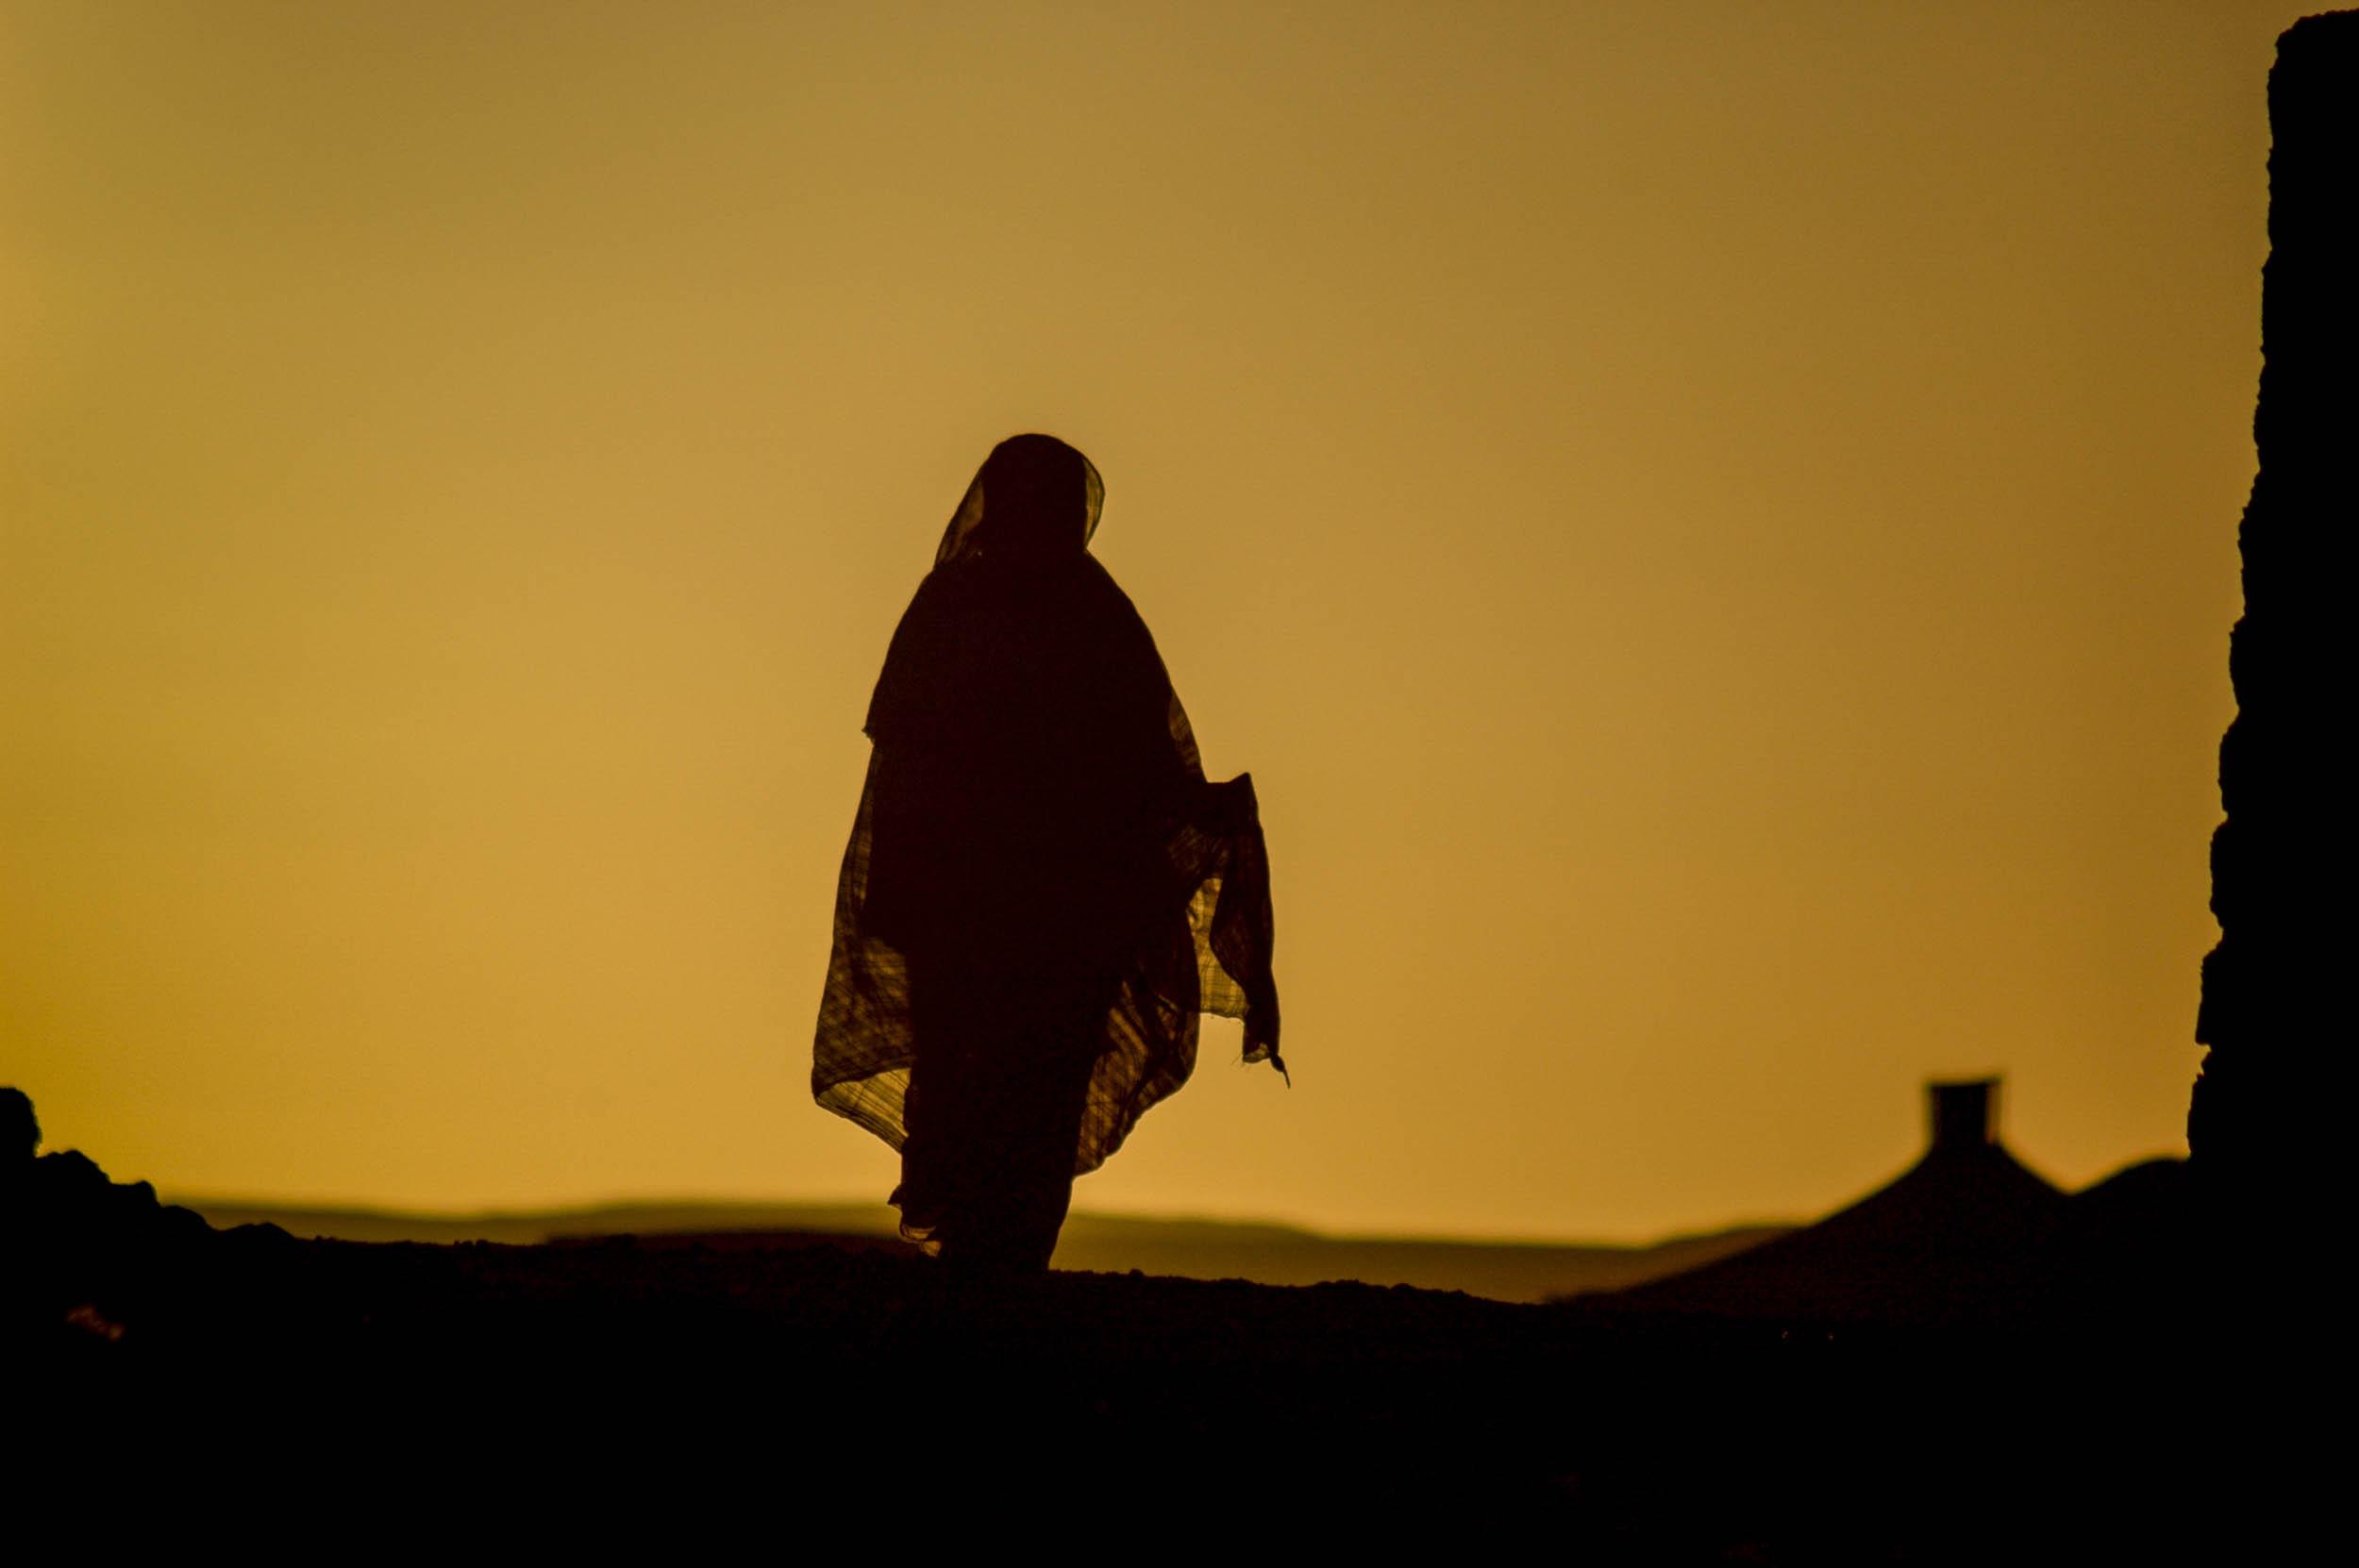 Tindouf, Sáhara - Ethnos - Hector Garrido, Aerial and human photography